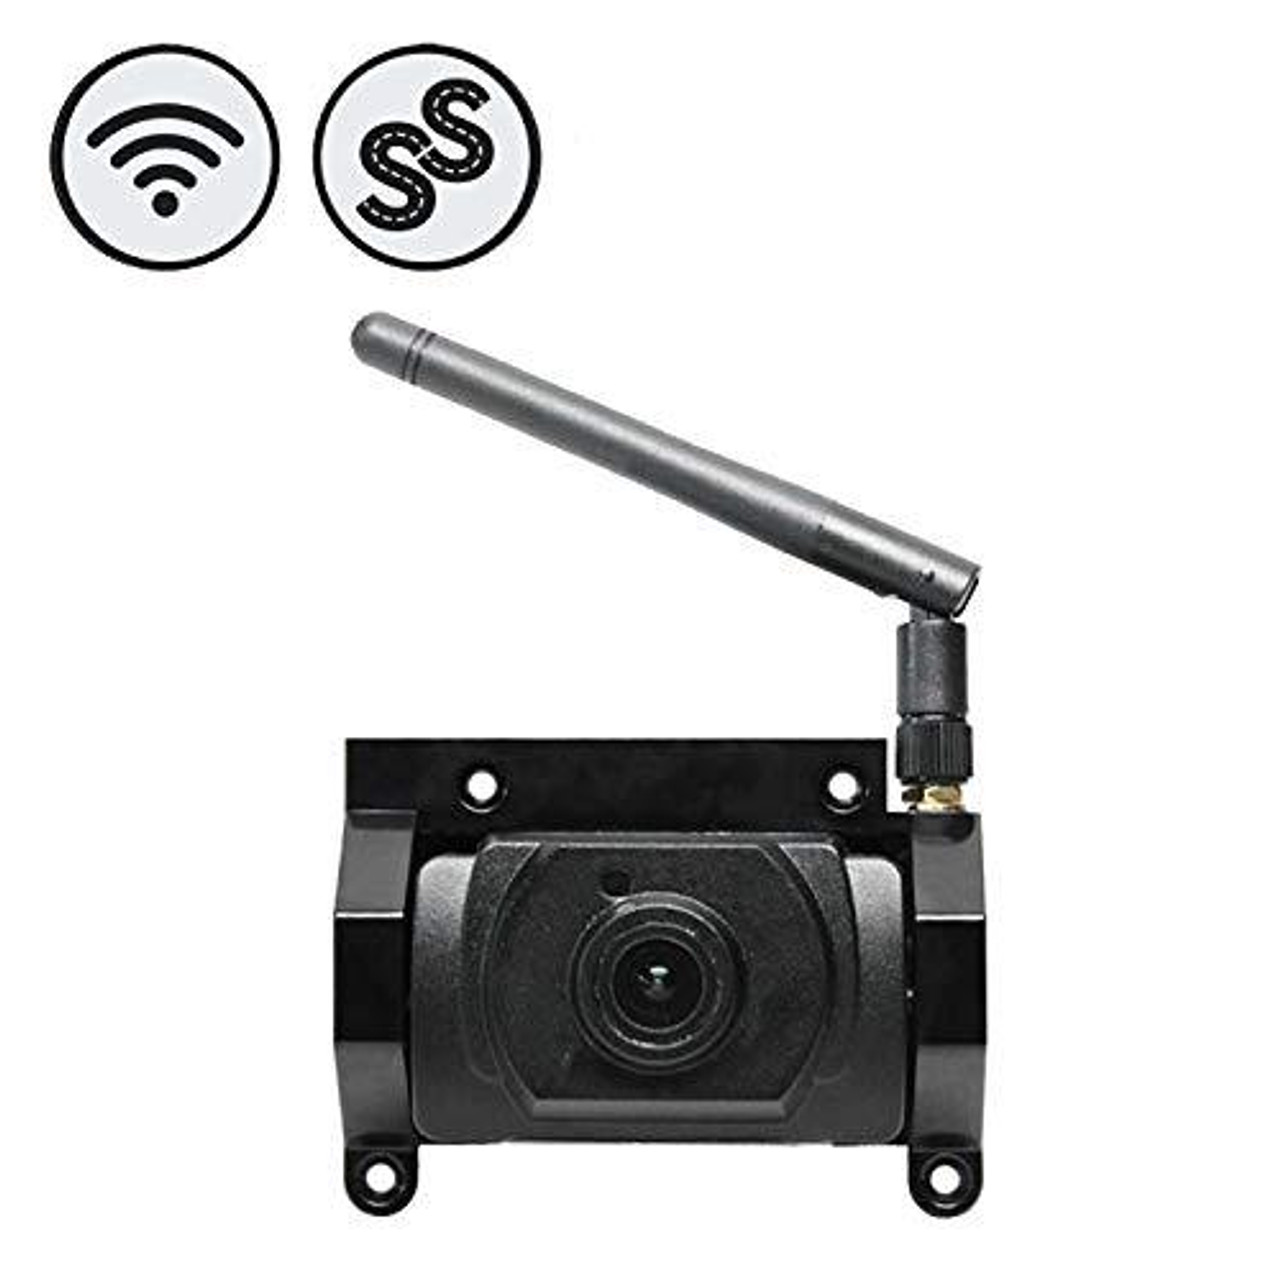 Simplesight™ Wireless Backup Camera for Prewire Kit